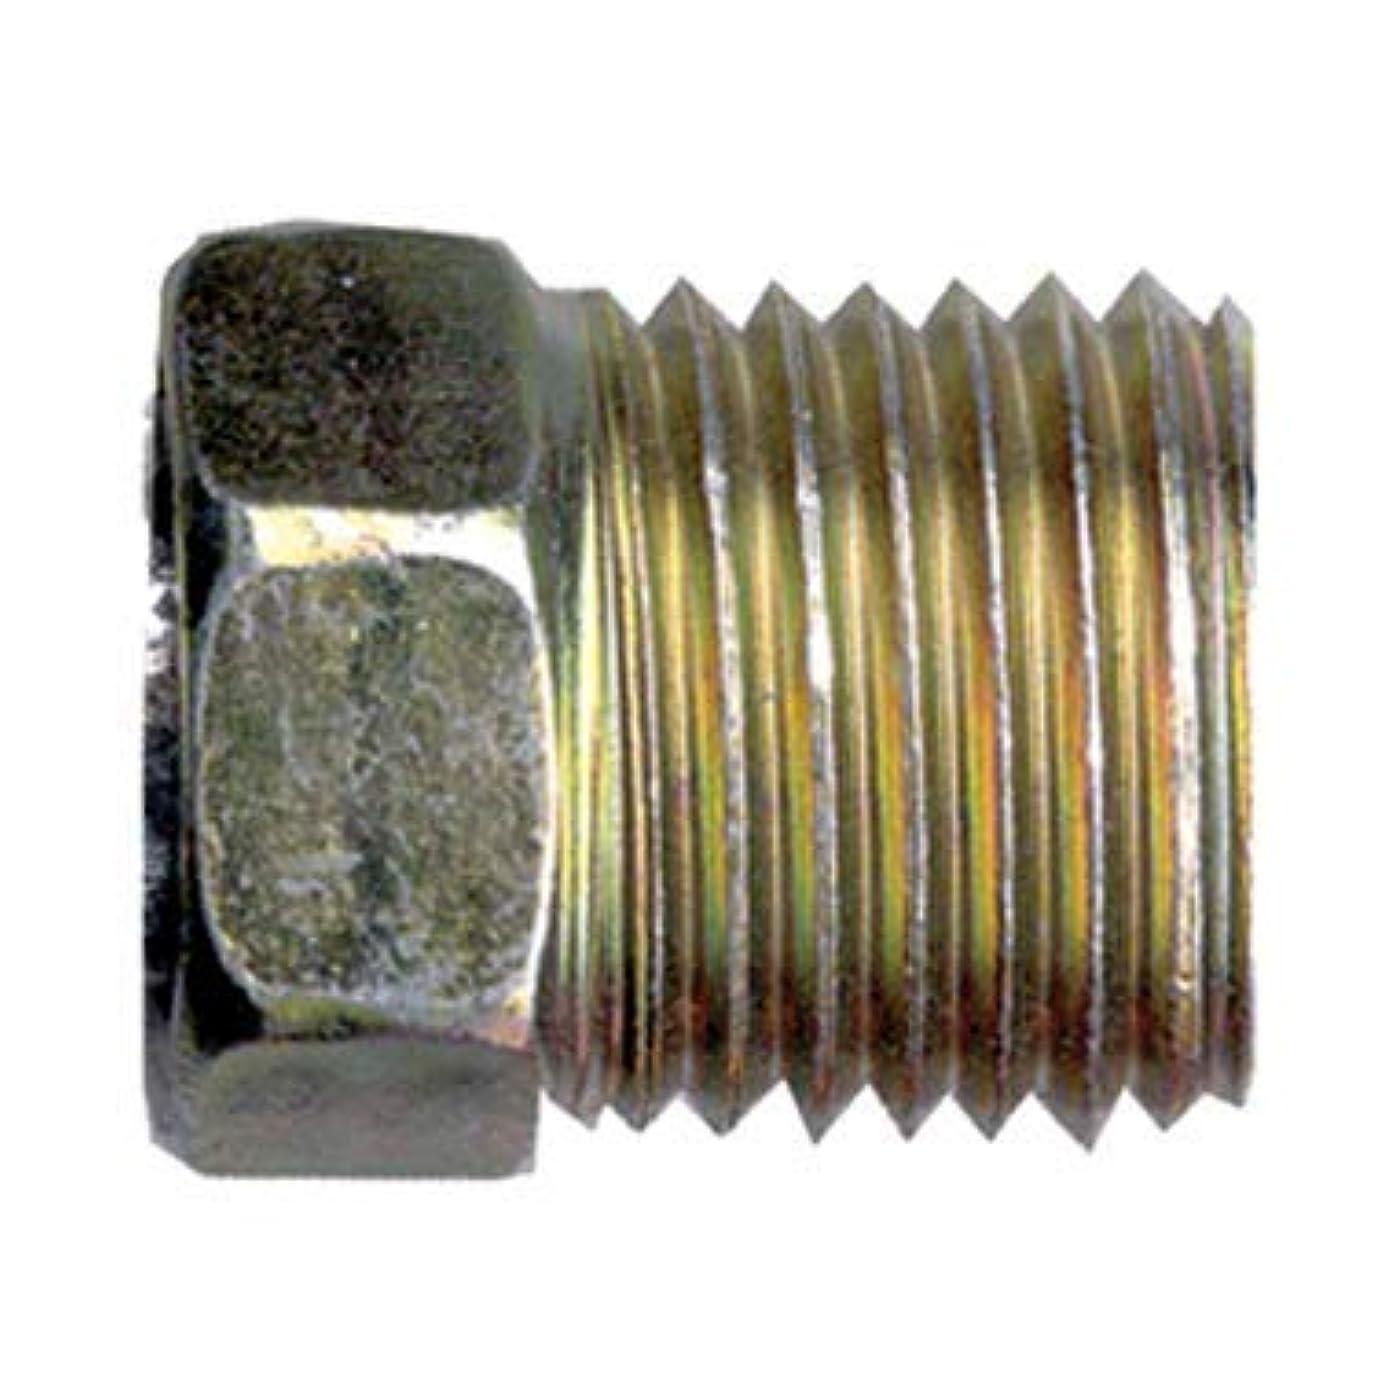 Fairview Fittings S141-3-1/2 Steel Nut 3/16 Tube X 1/2 Long Pack of 20